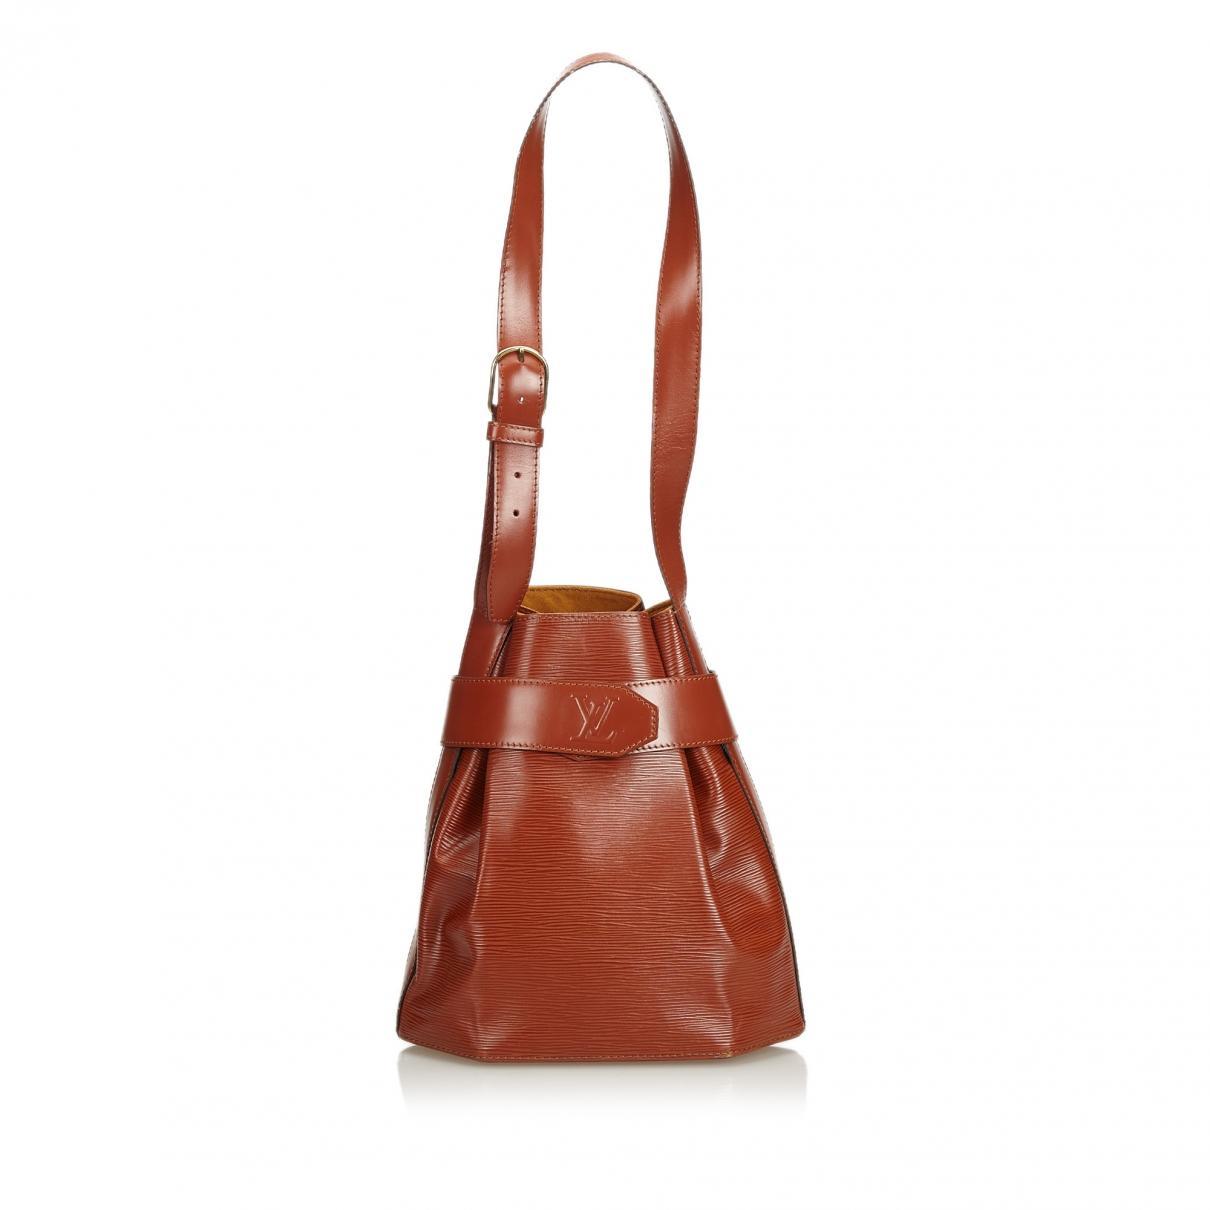 dca526507b7627 Lyst - Louis Vuitton Vintage Brown Leather Handbag in Brown